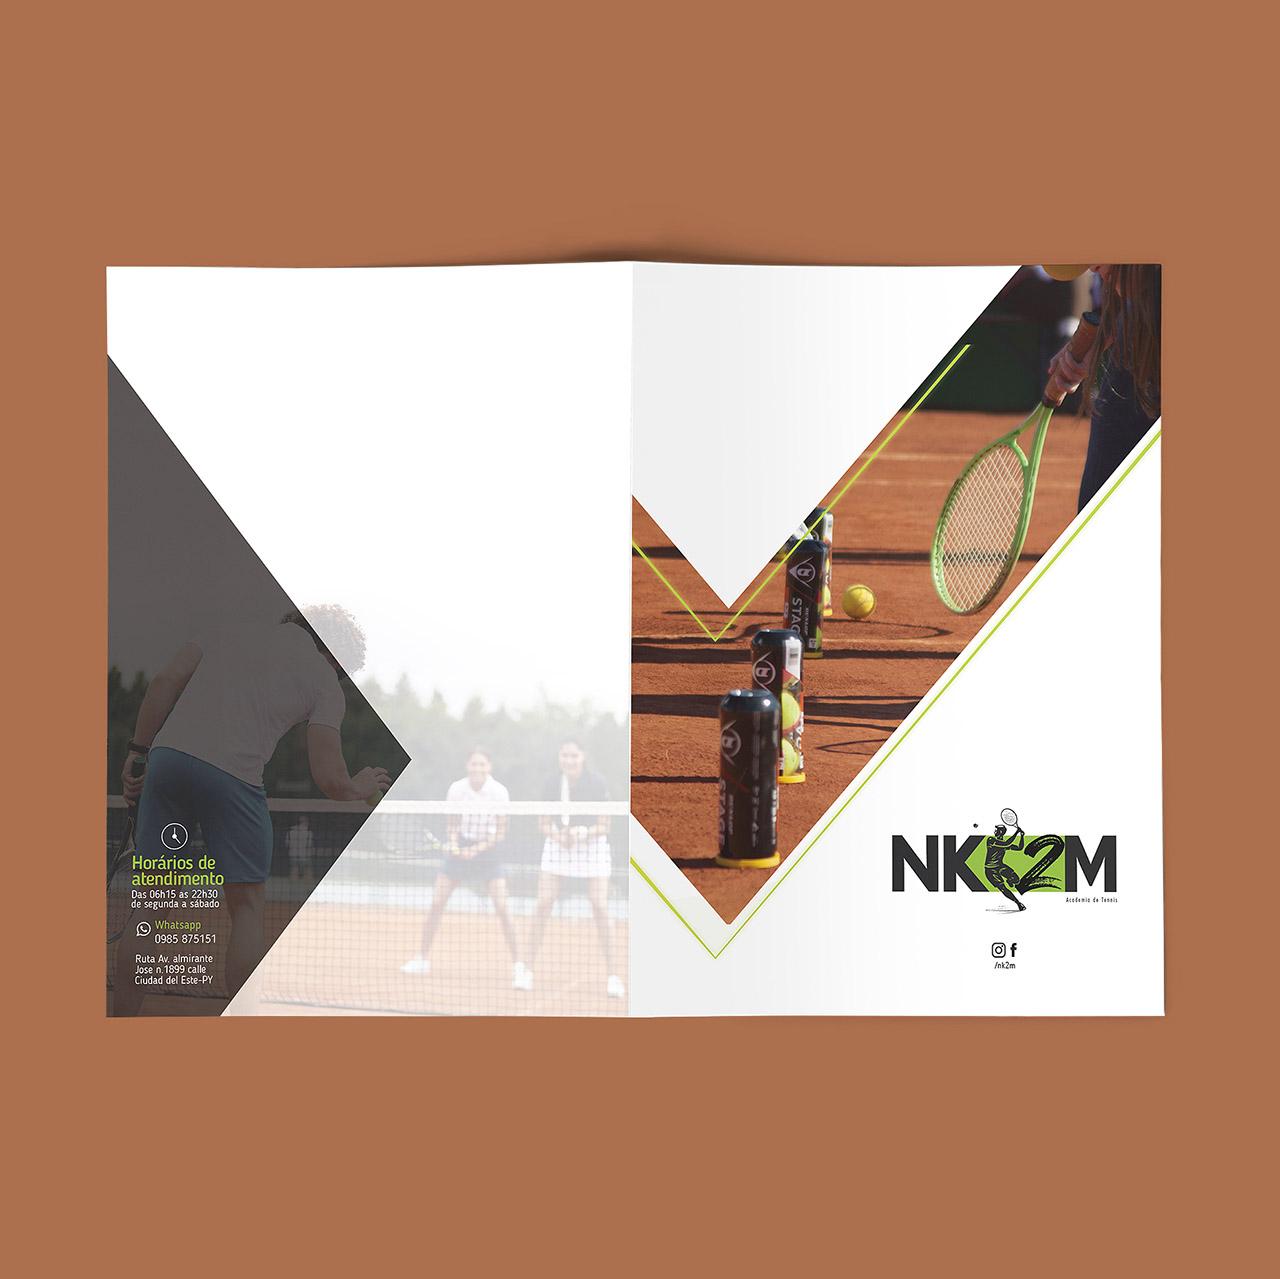 NK2M Tennis